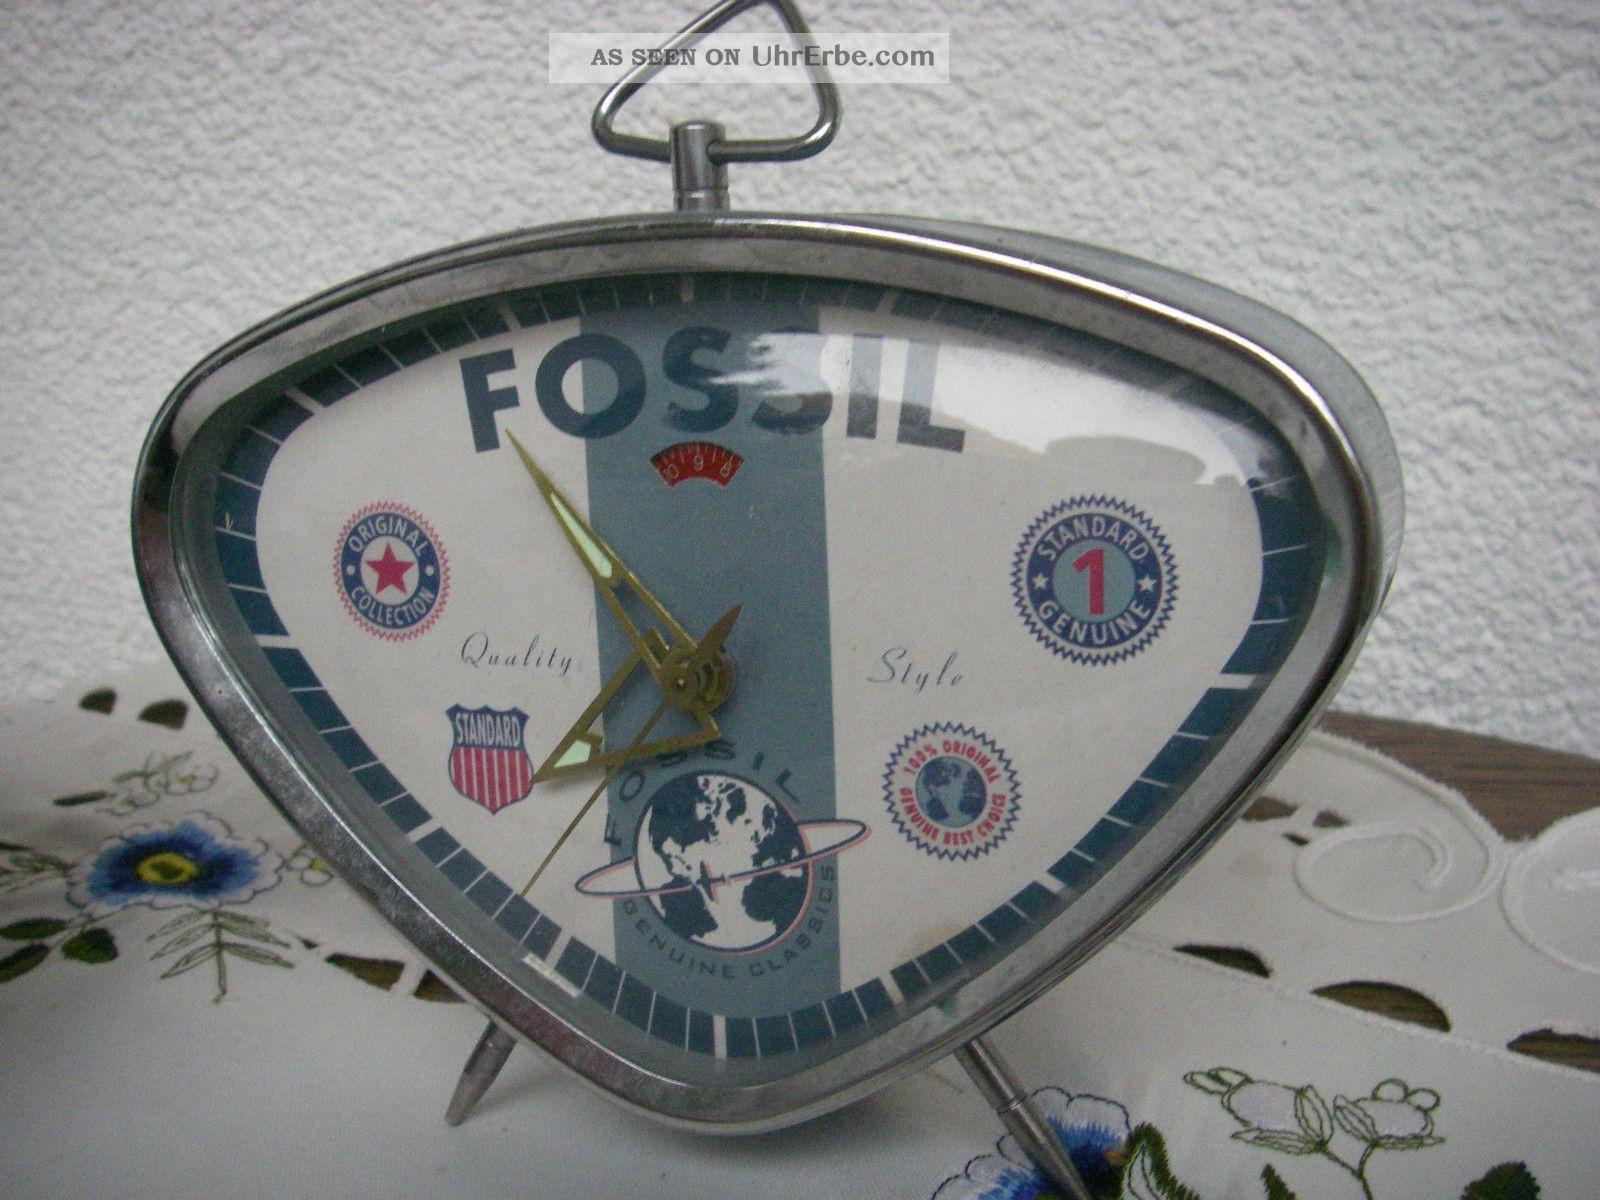 wecker retro style authentic fossil alarm clock drei st ck. Black Bedroom Furniture Sets. Home Design Ideas